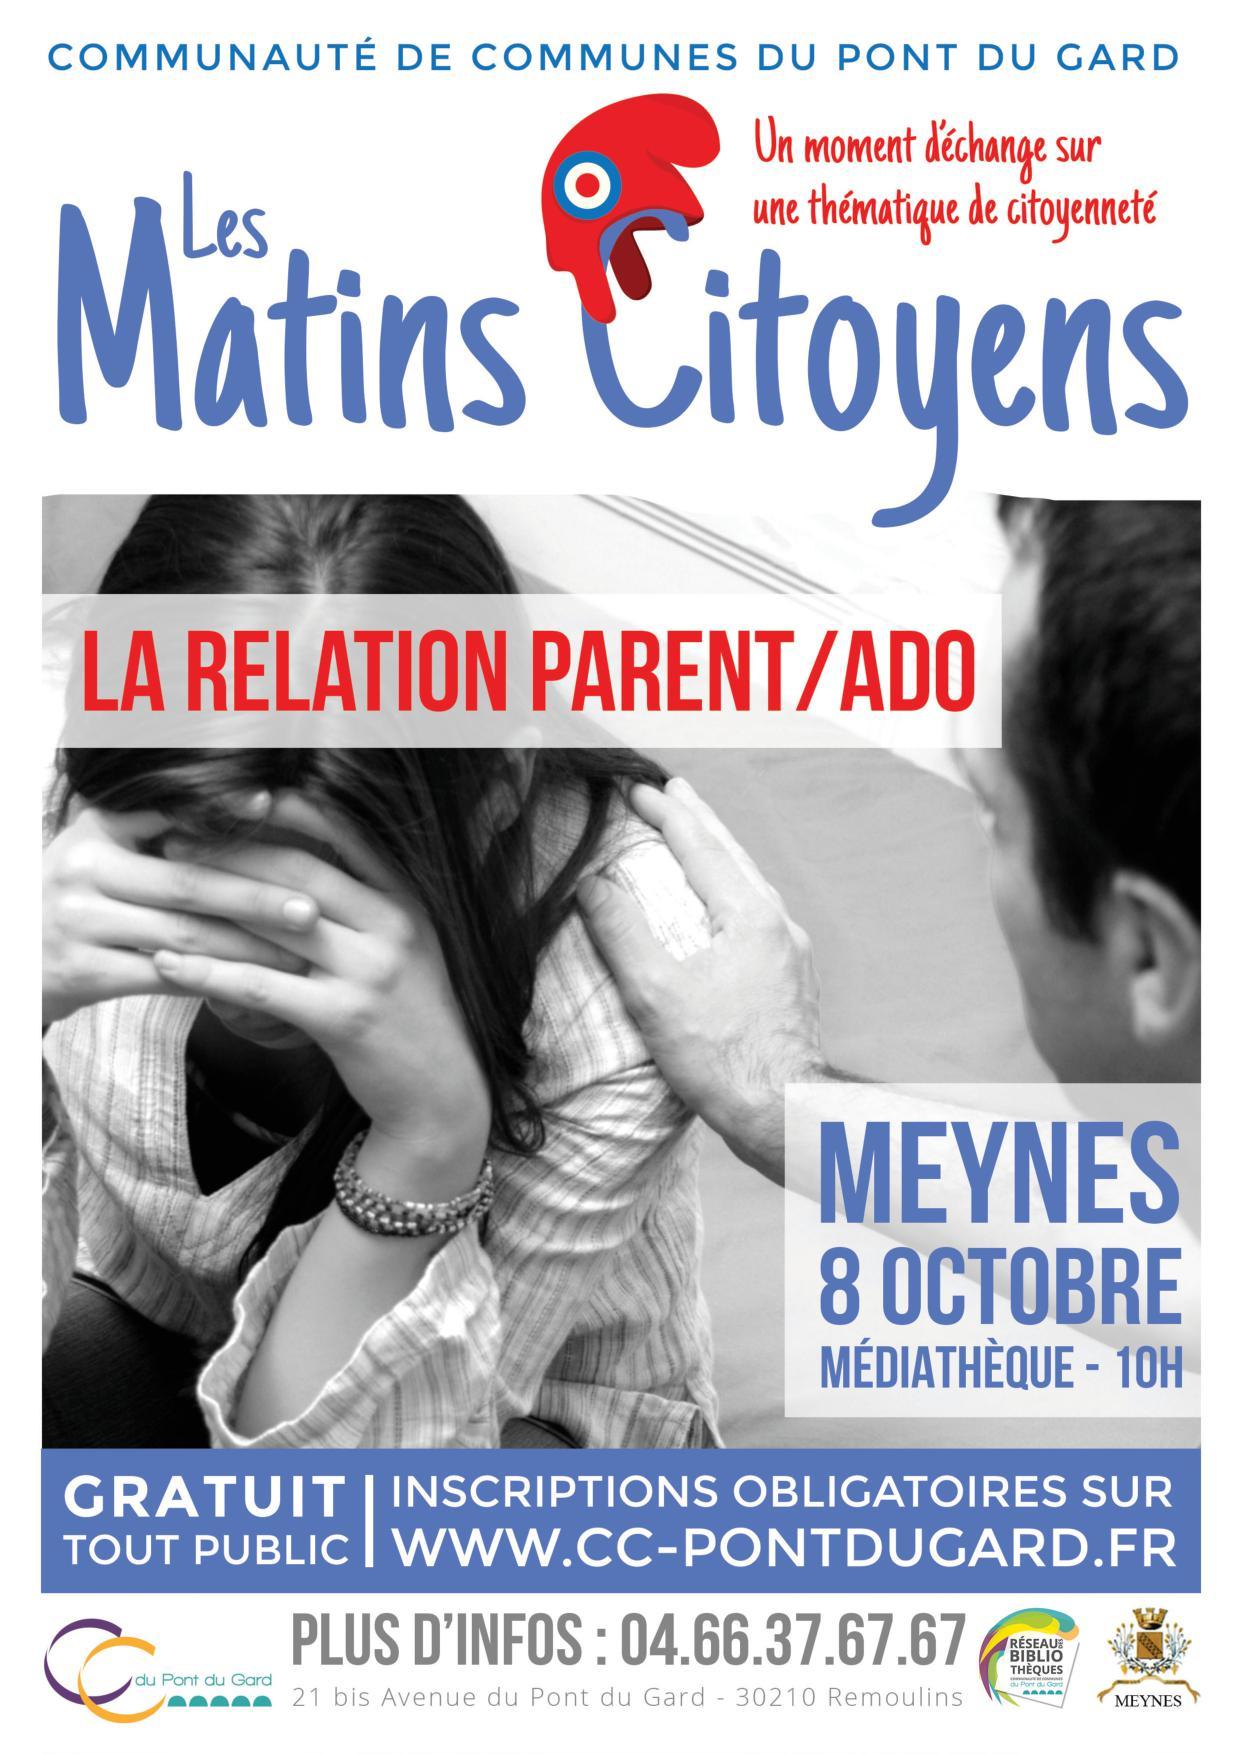 Matin Citoyen : relation parent/ado